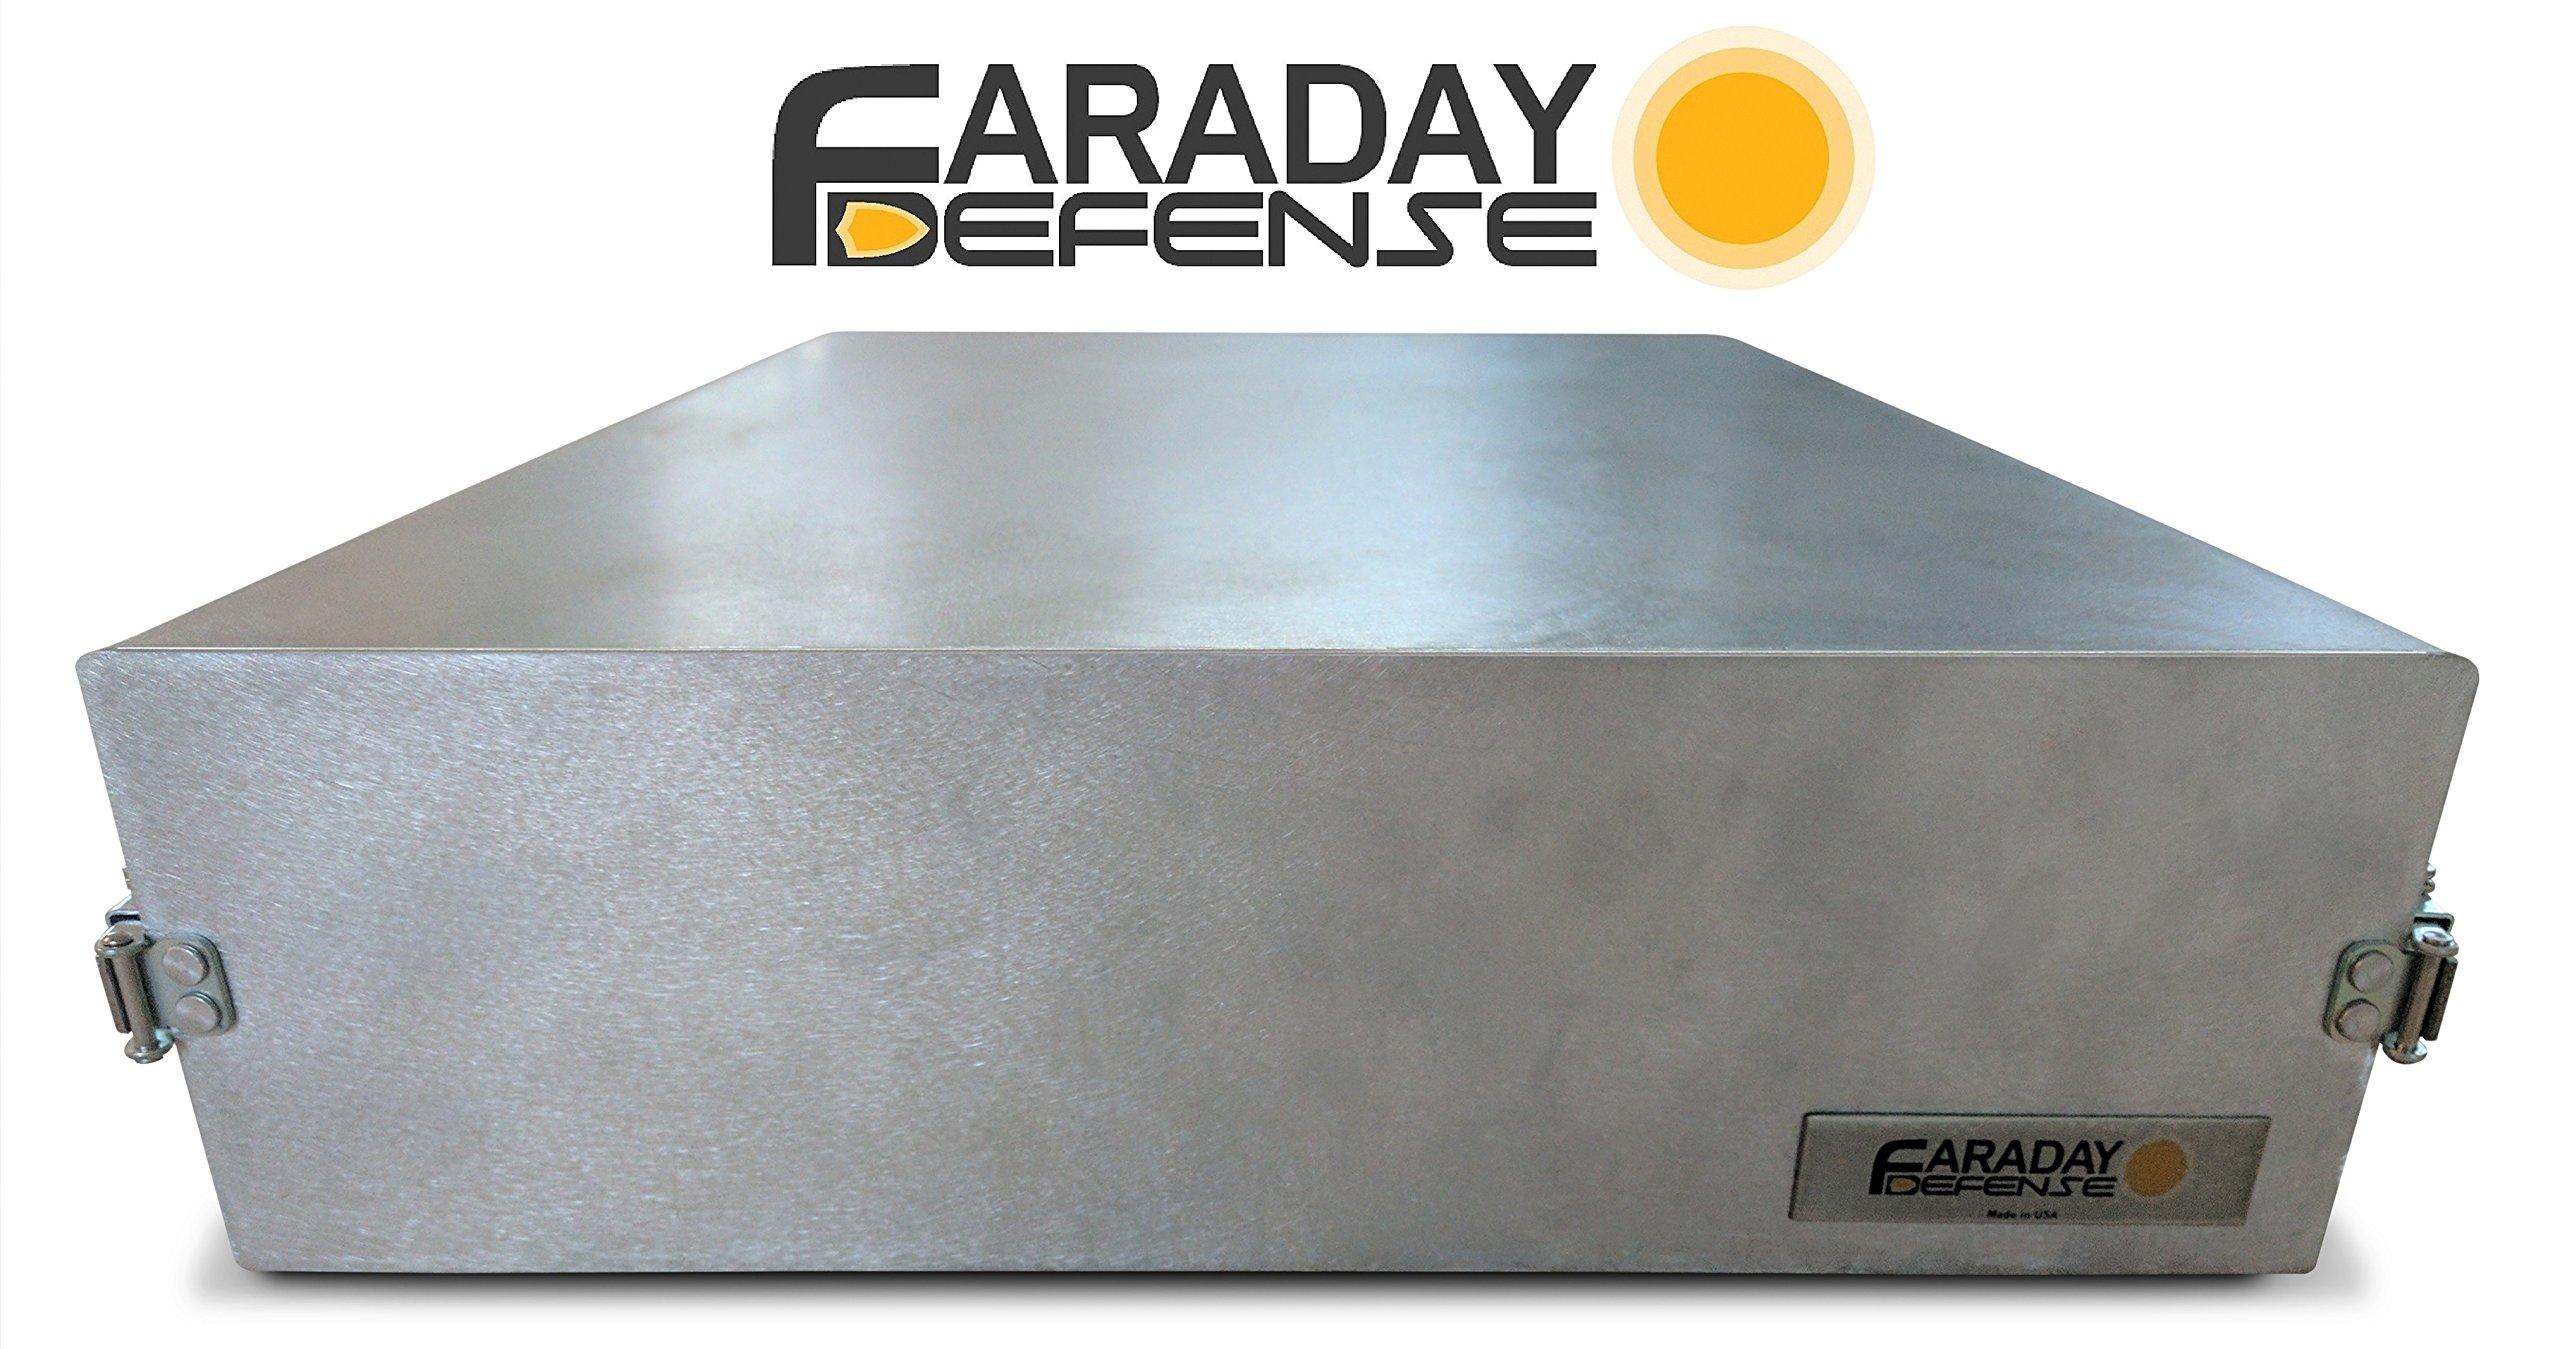 Faraday Defense - Solid Metal Faraday Cage, Bug Out Box, EMP Protection, Solar Flare, RF RFID Blocking by Faraday Defense